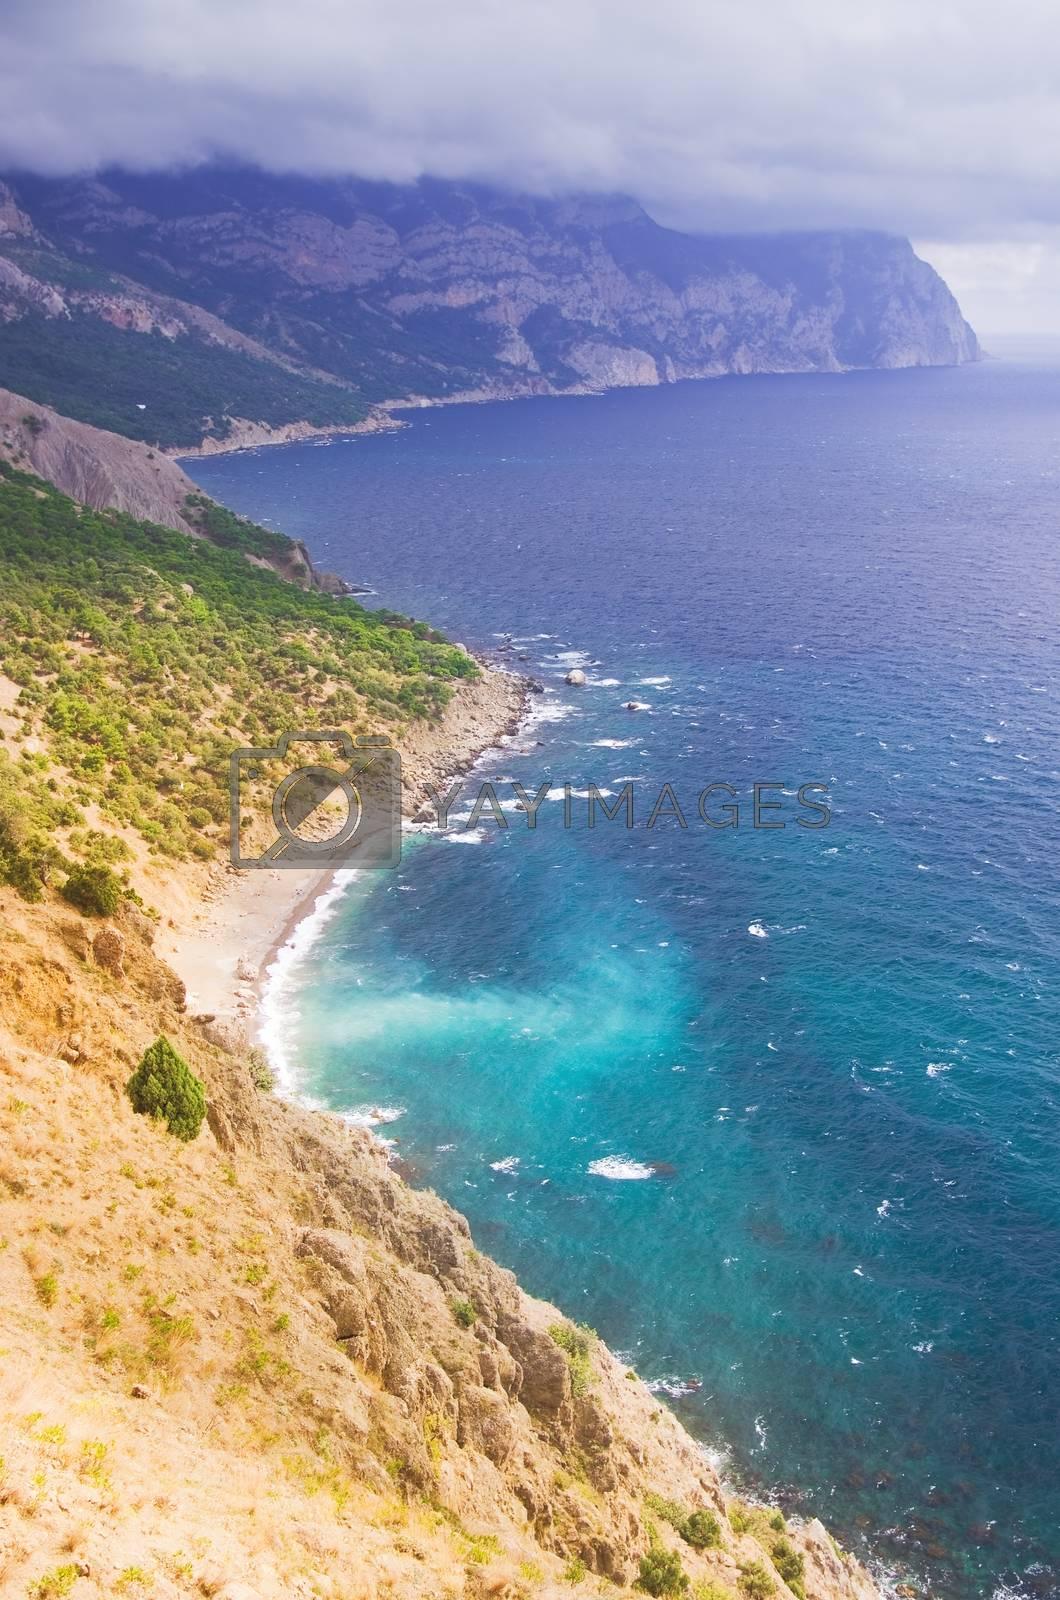 Amazing landscape of the Black Sea and a mountain in Crimea, Ukraine